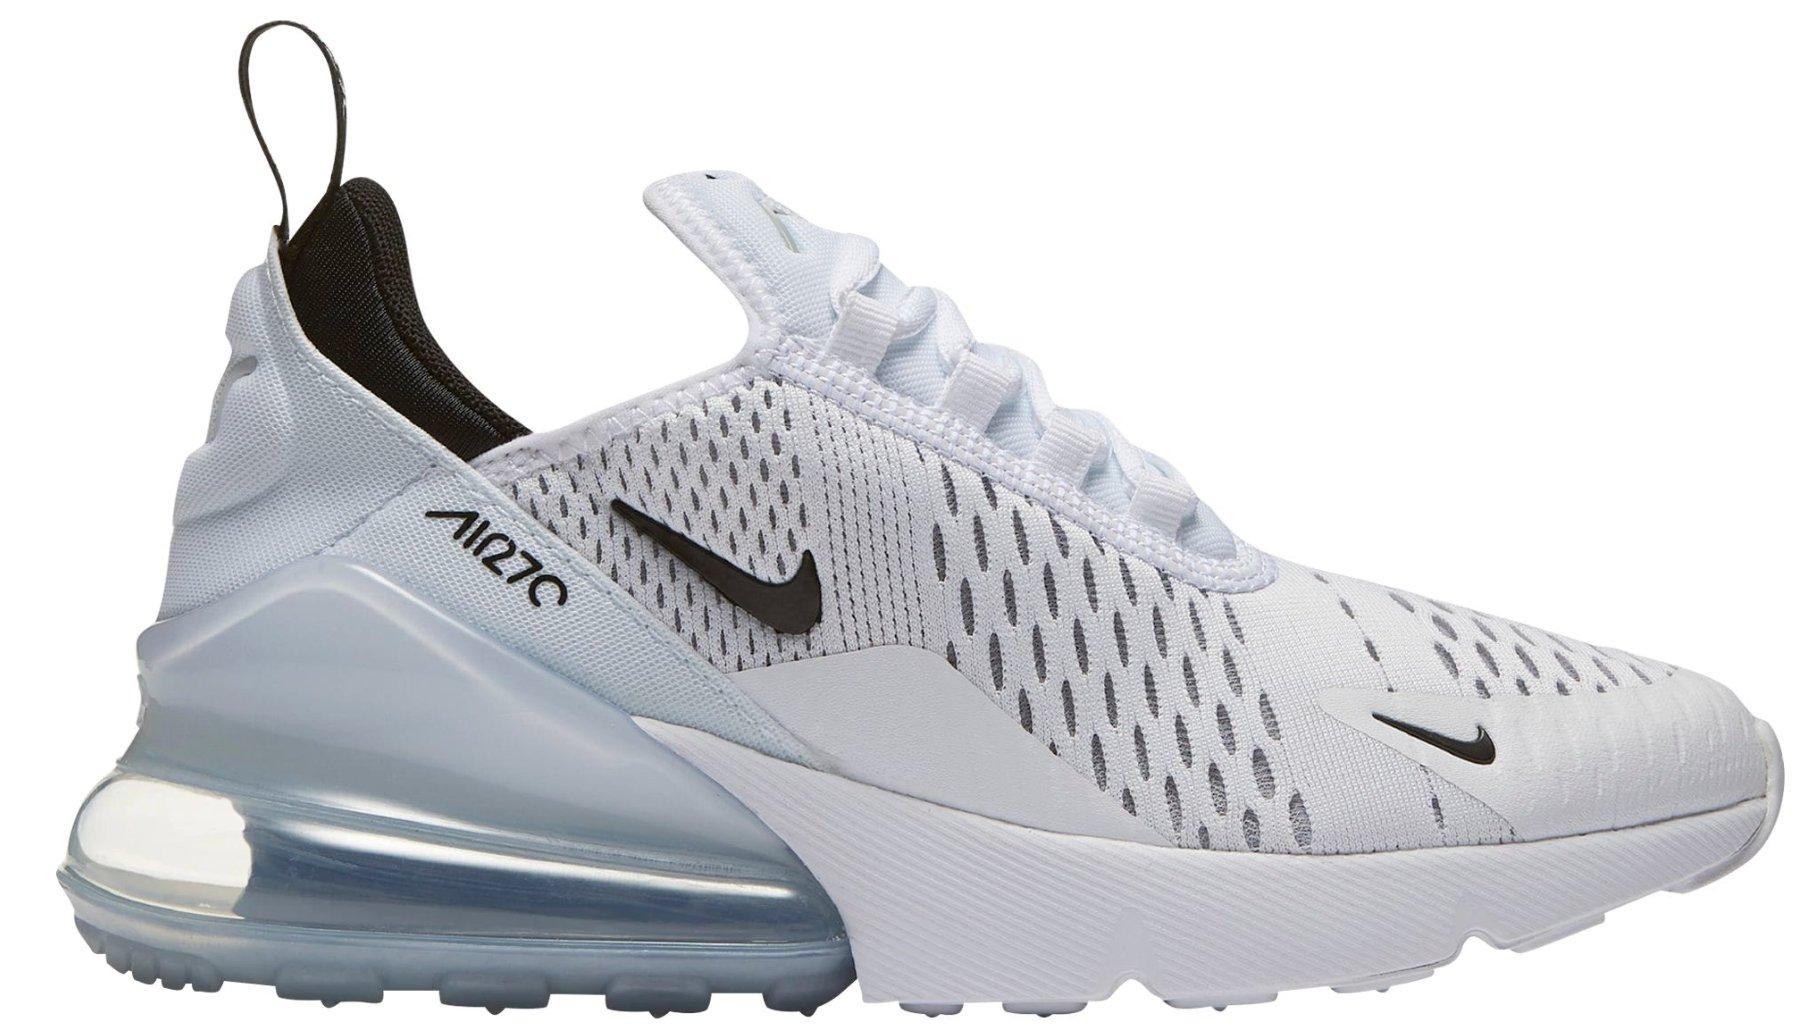 154cbbbe86f8 Galleon - Nike Air Max 270 Big Kids' Running Shoes White/Black-White 943345-100  (4.5 M US)